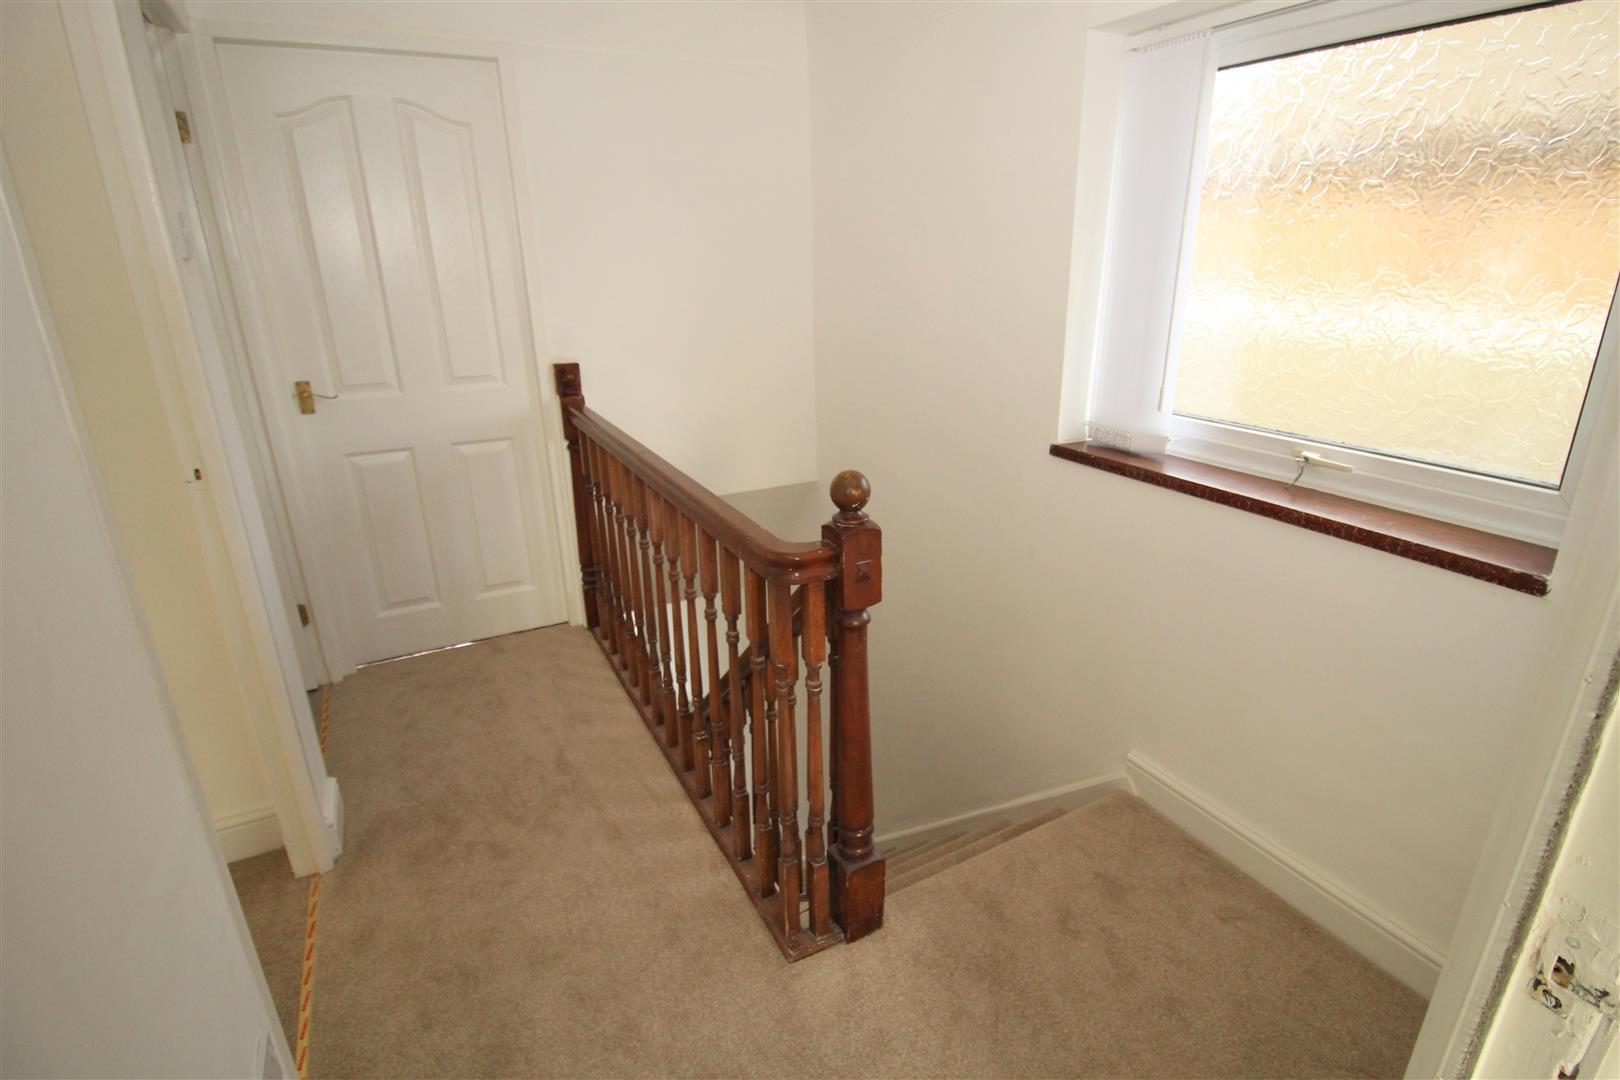 3 Bedrooms, House - Semi-Detached, Charterhouse Drive, Liverpool